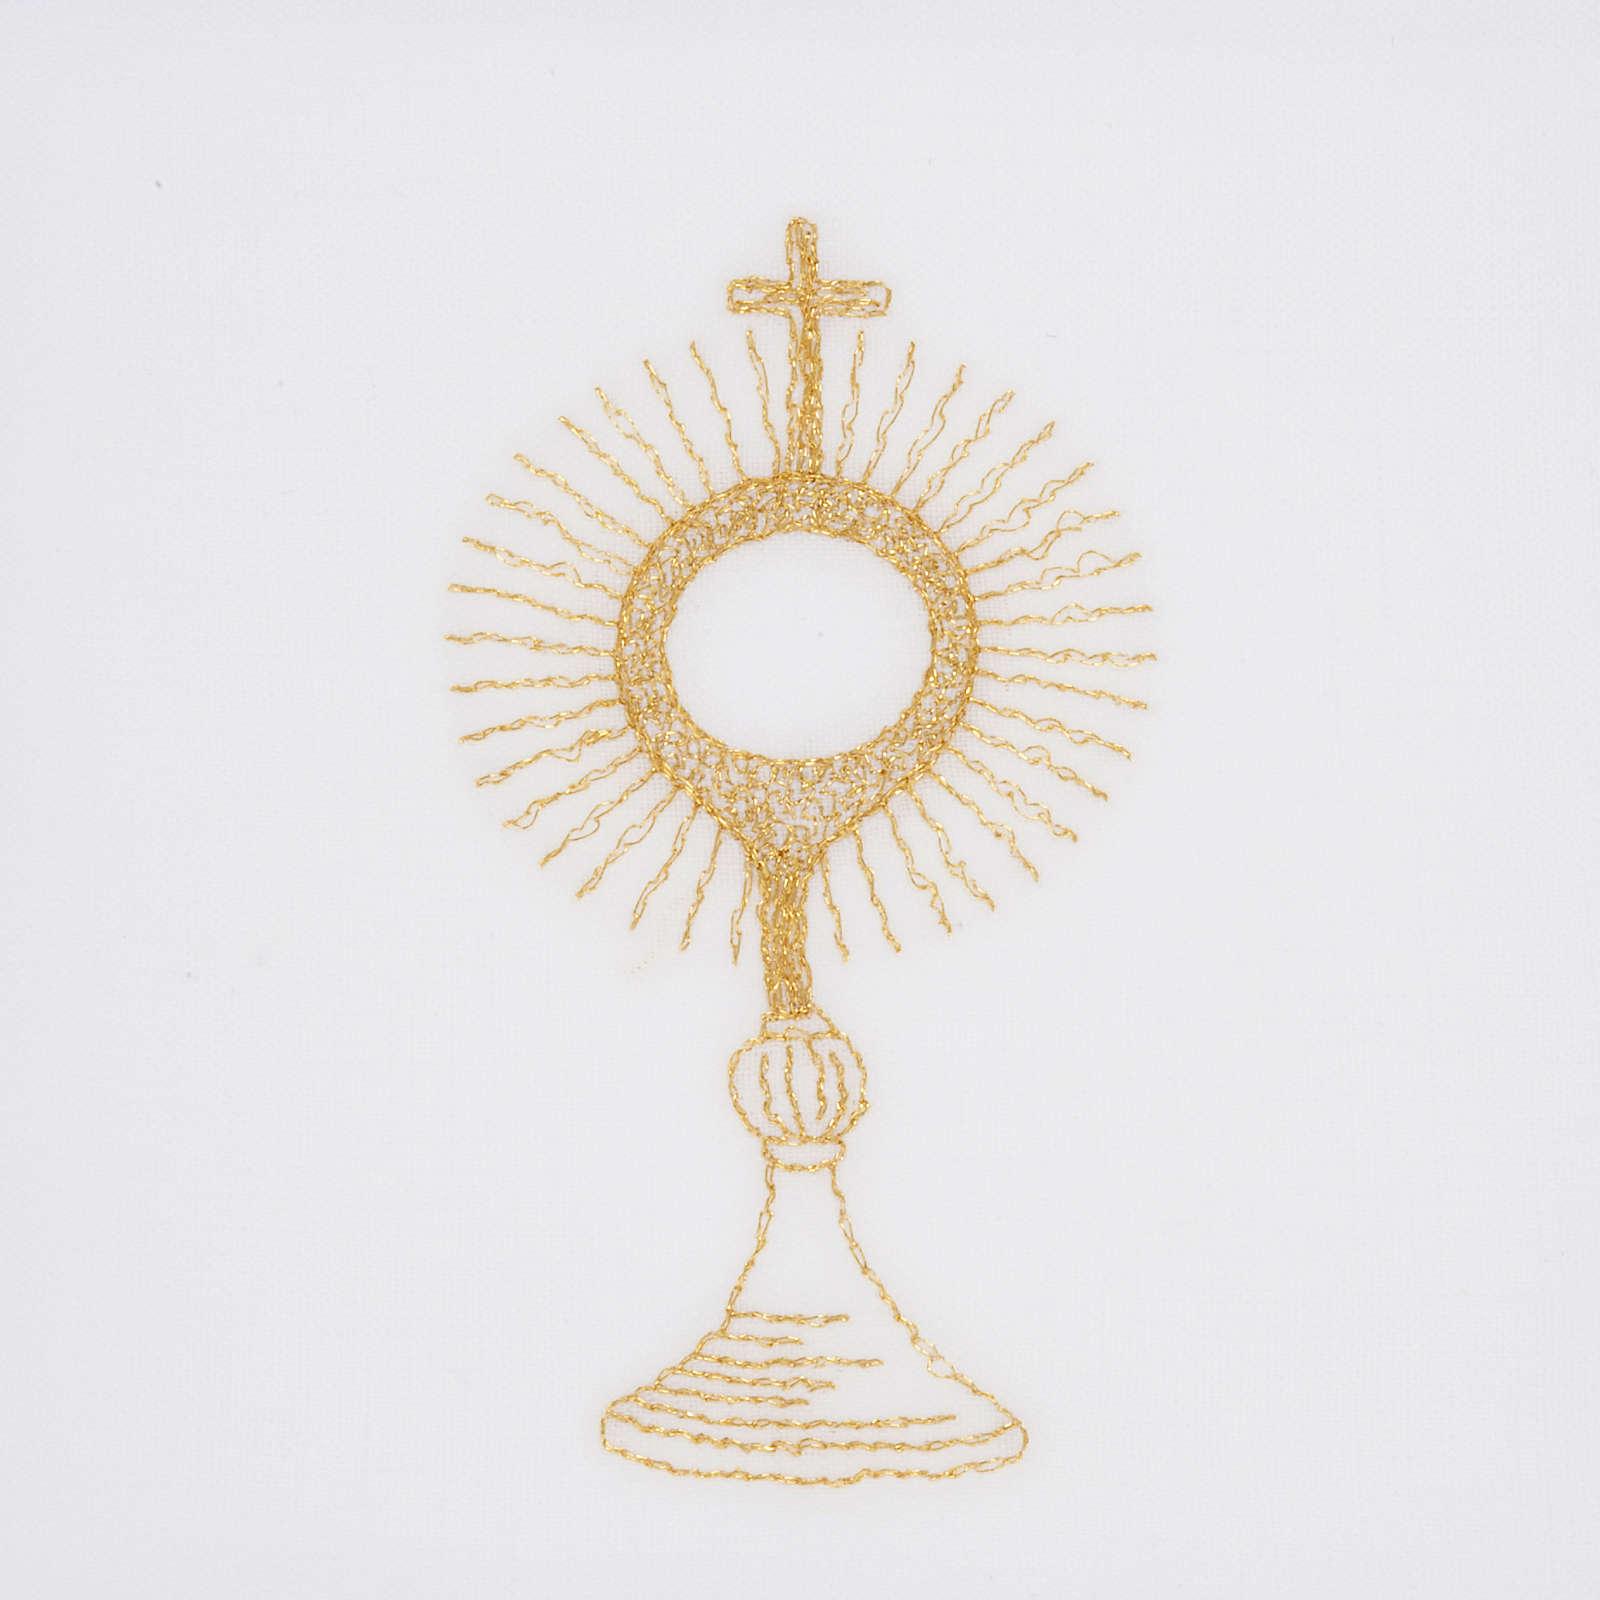 Mass linens with golden monstrance 4